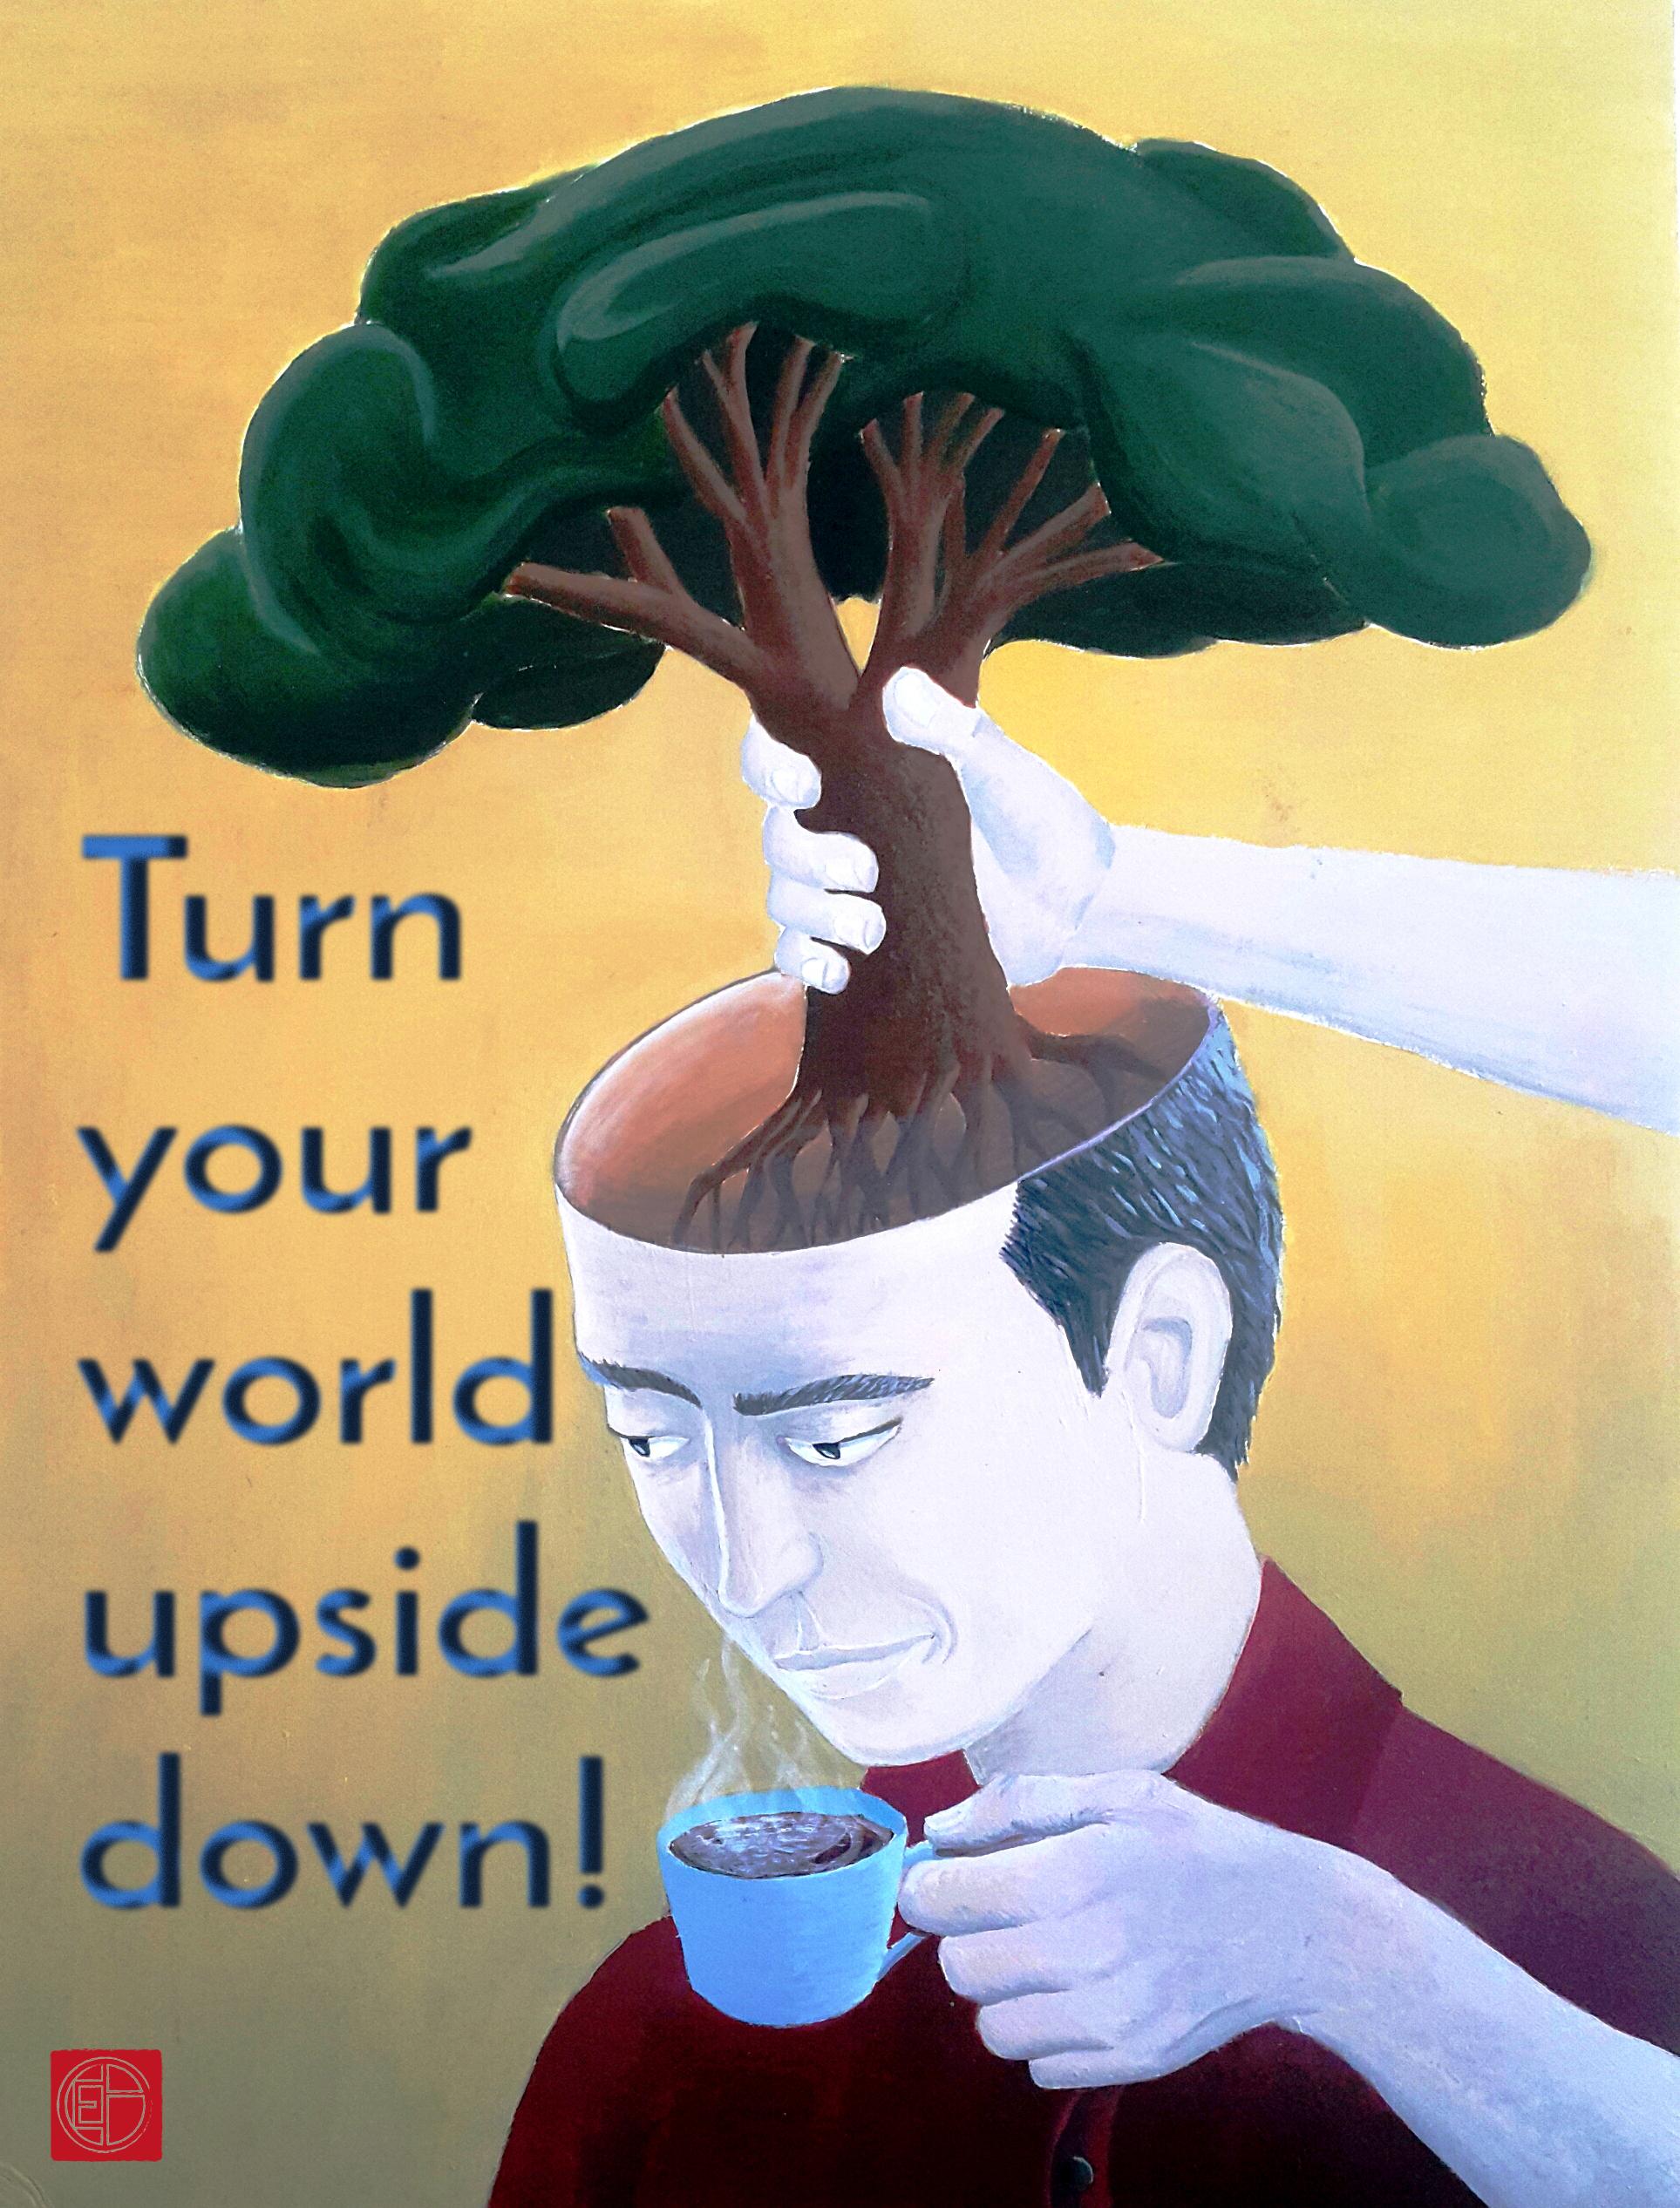 Turn my world upside down-text